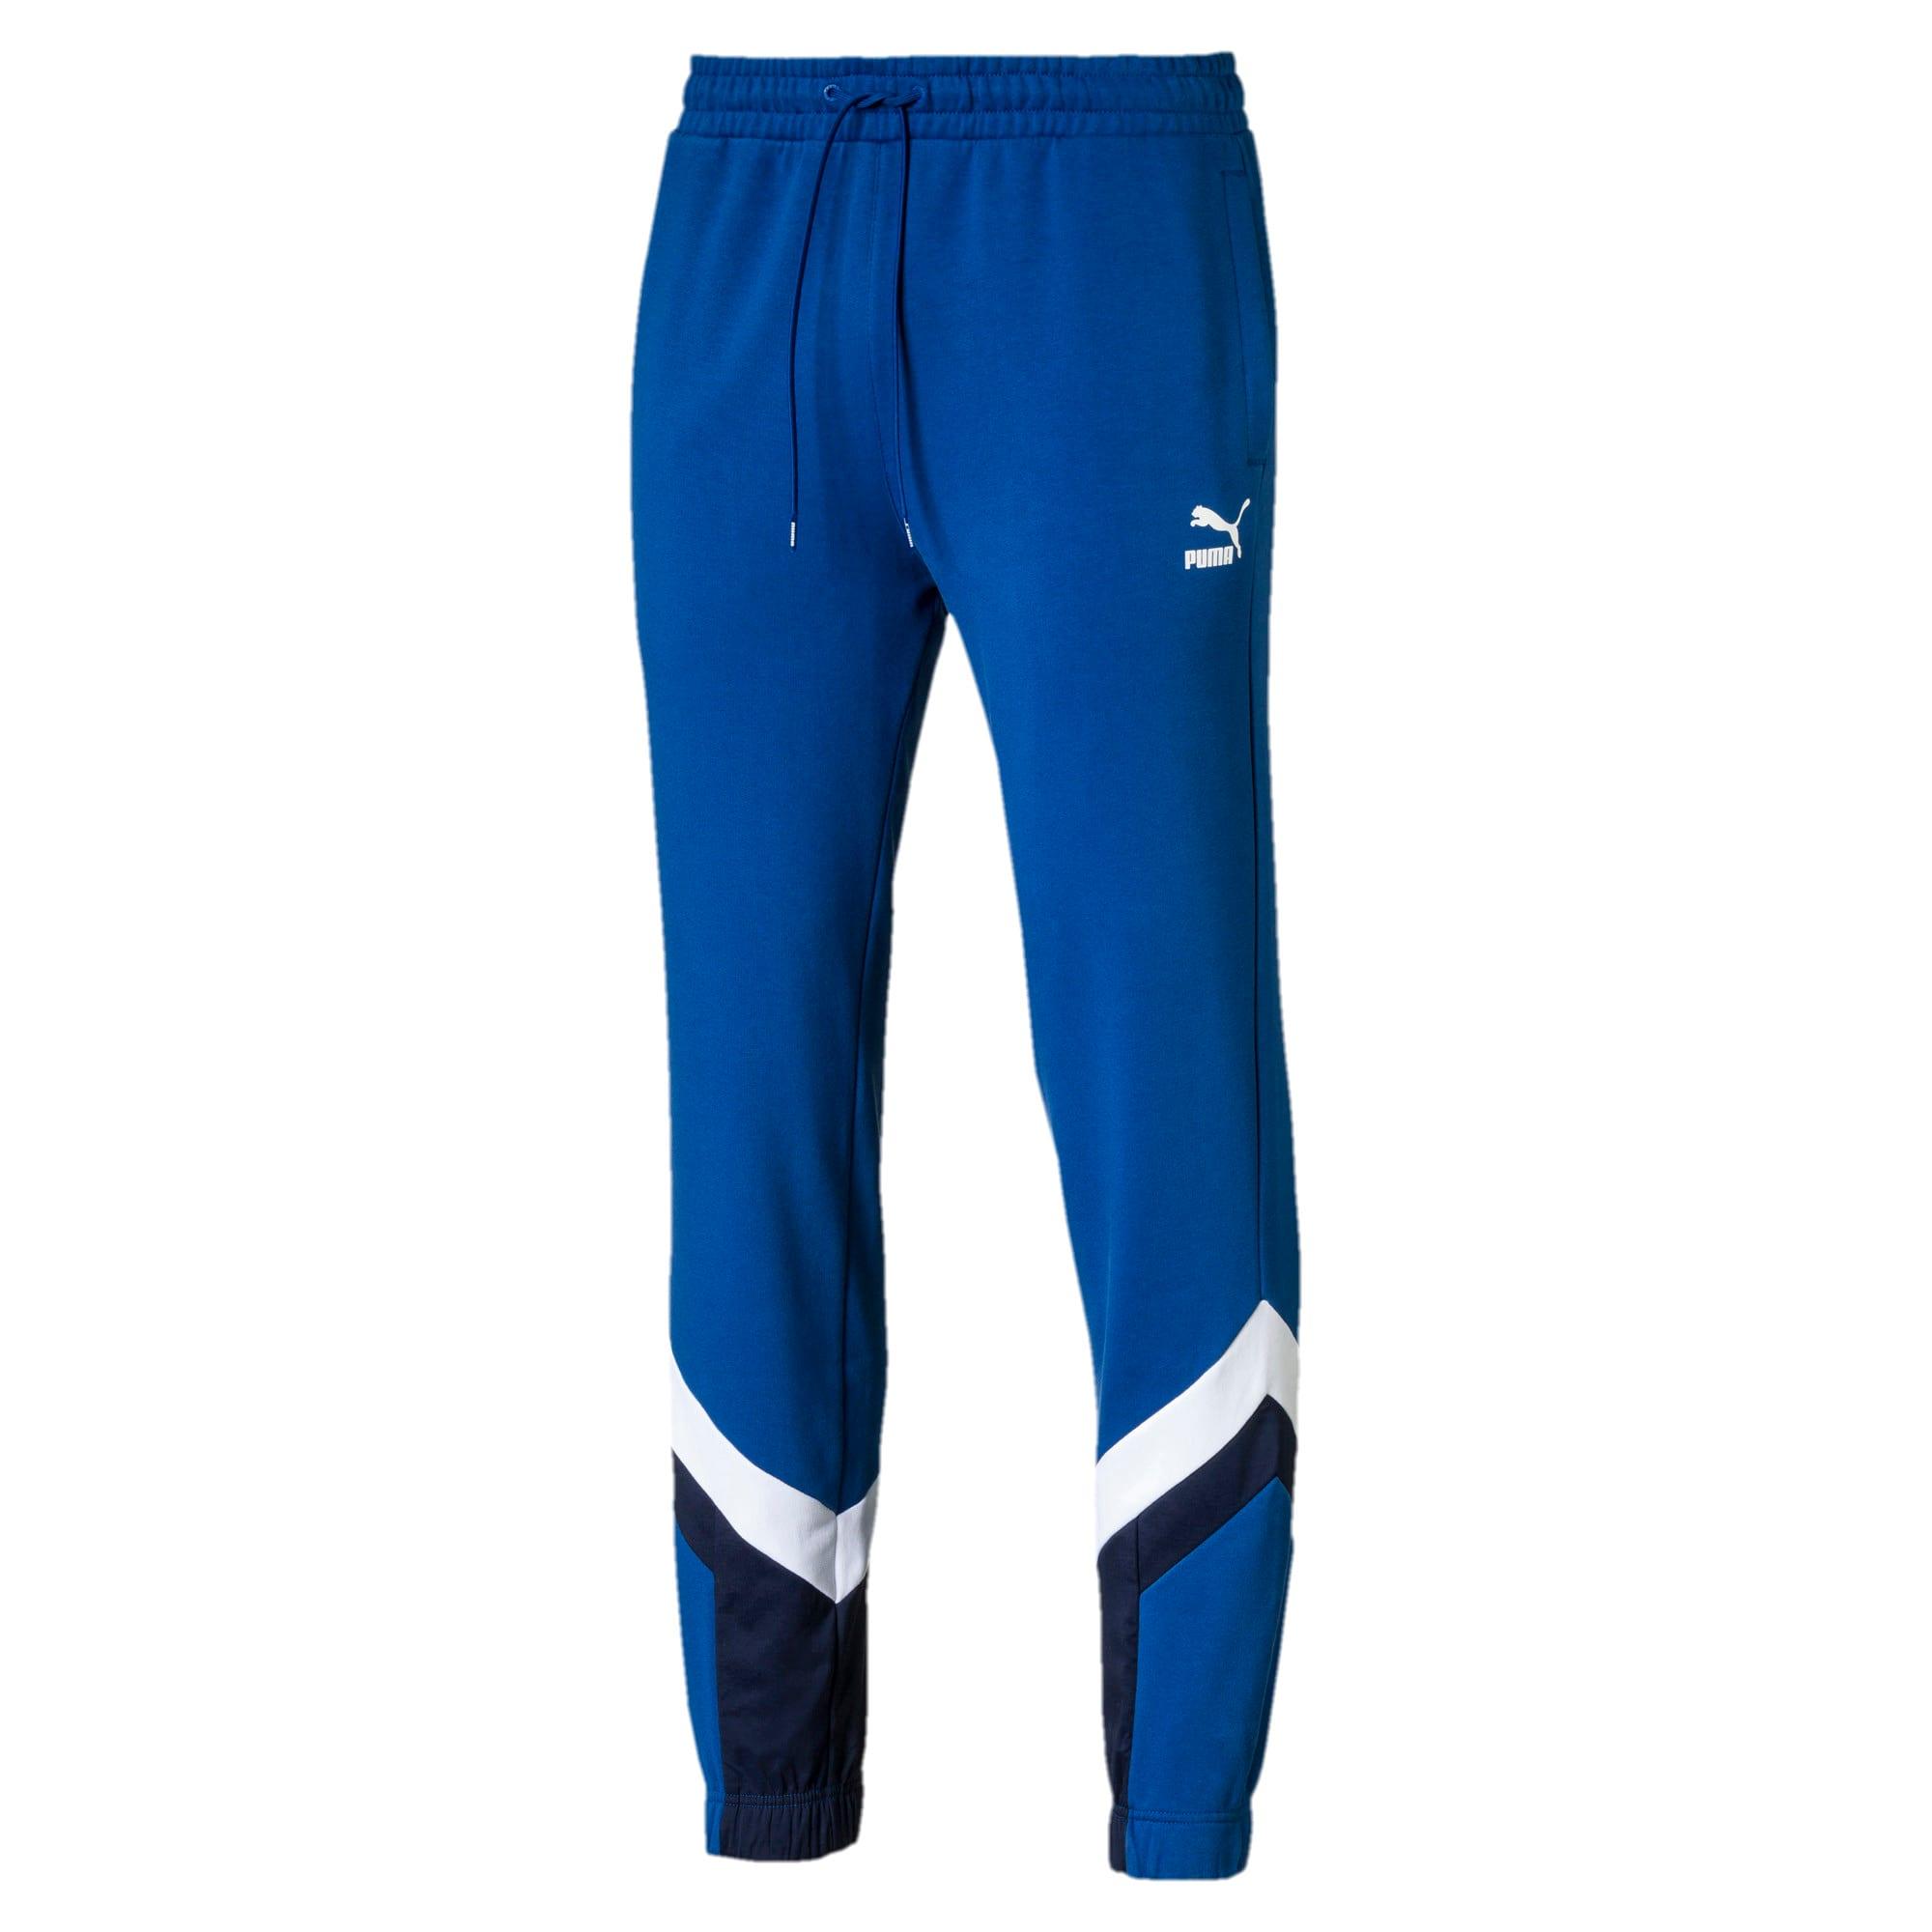 Thumbnail 1 of Iconic MCS Men's Track Pants, Galaxy Blue, medium